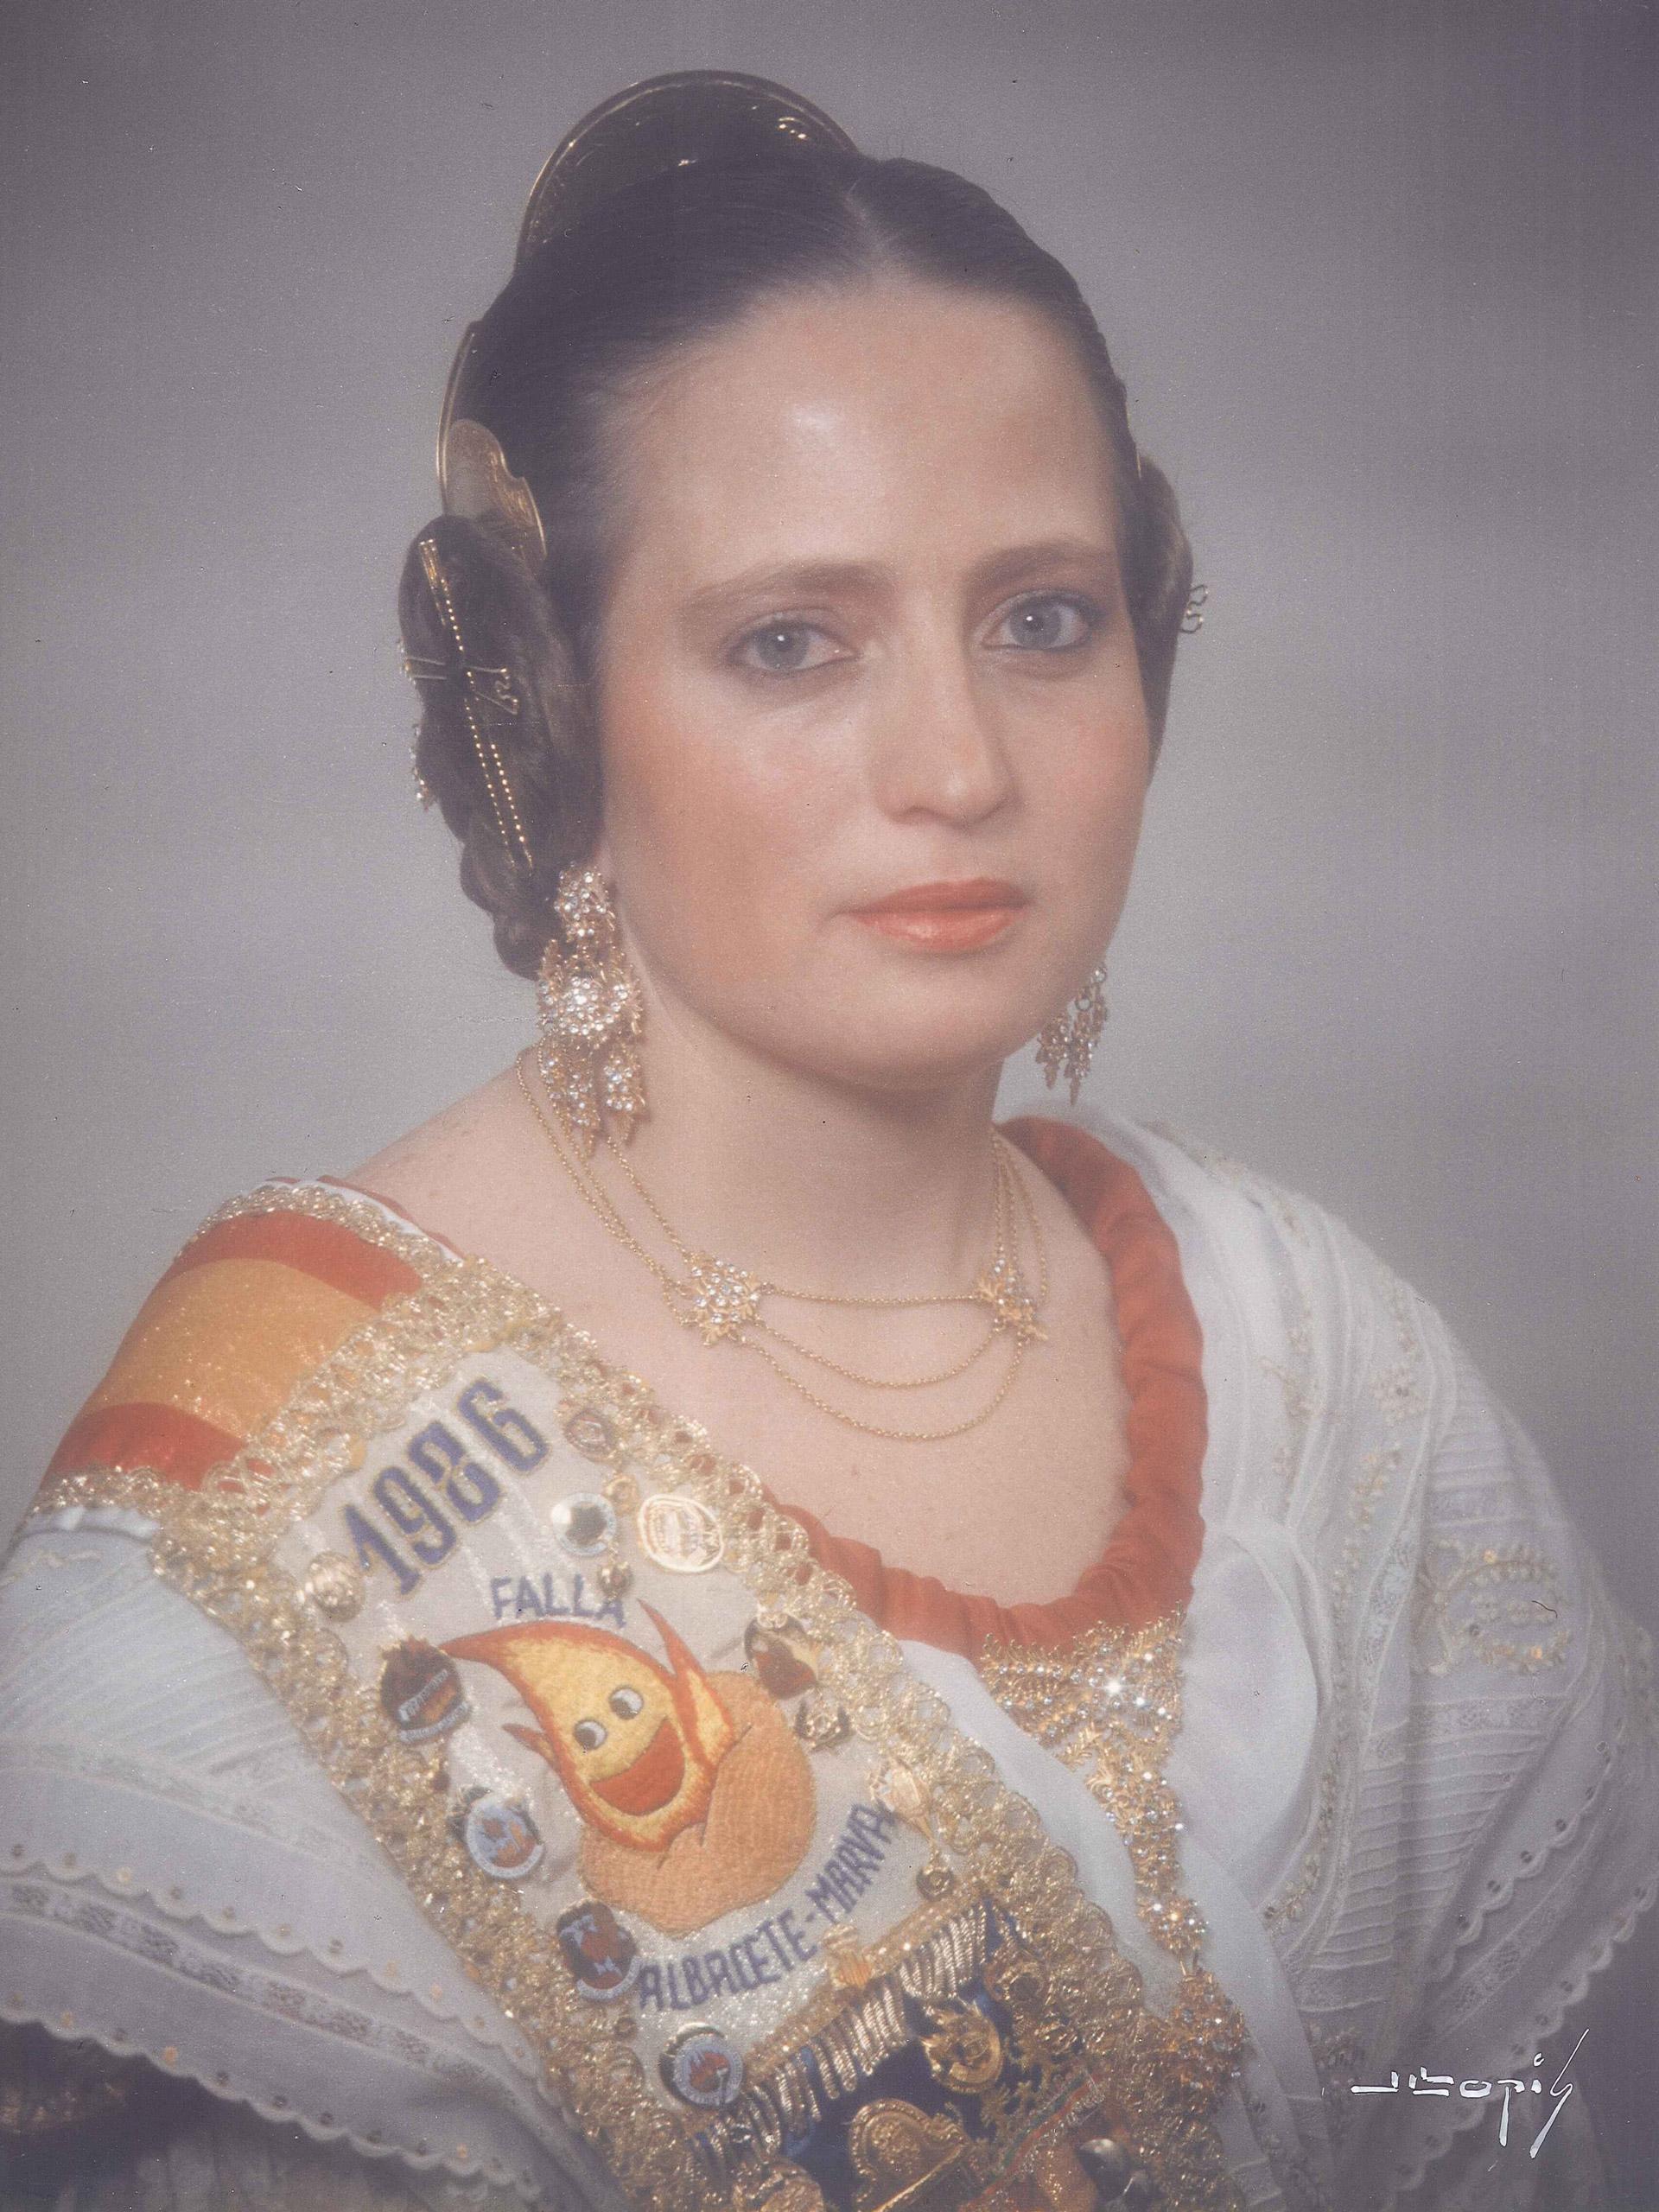 FM_1986